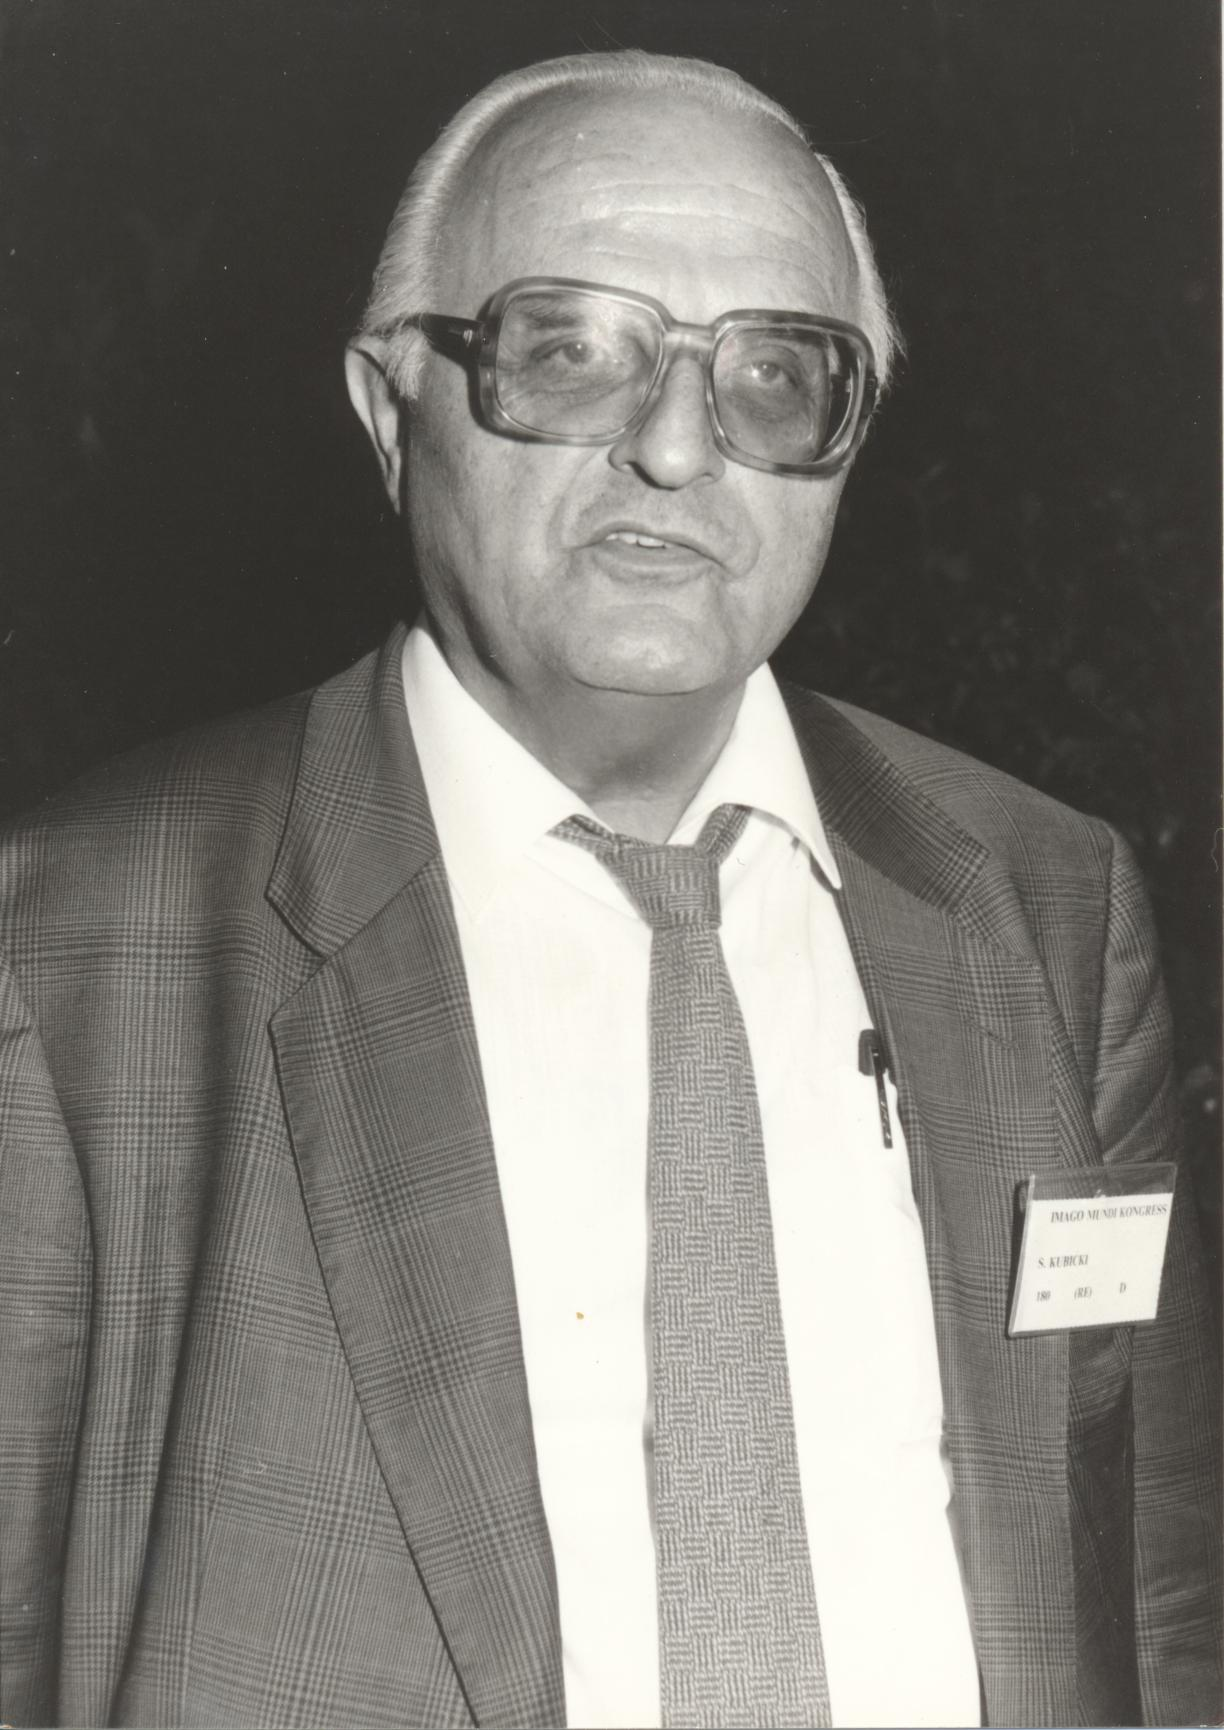 XII. Imago Mundi-Kongress 1989, Innsbruck, Prof. Dr. Stanislaw Kubicki